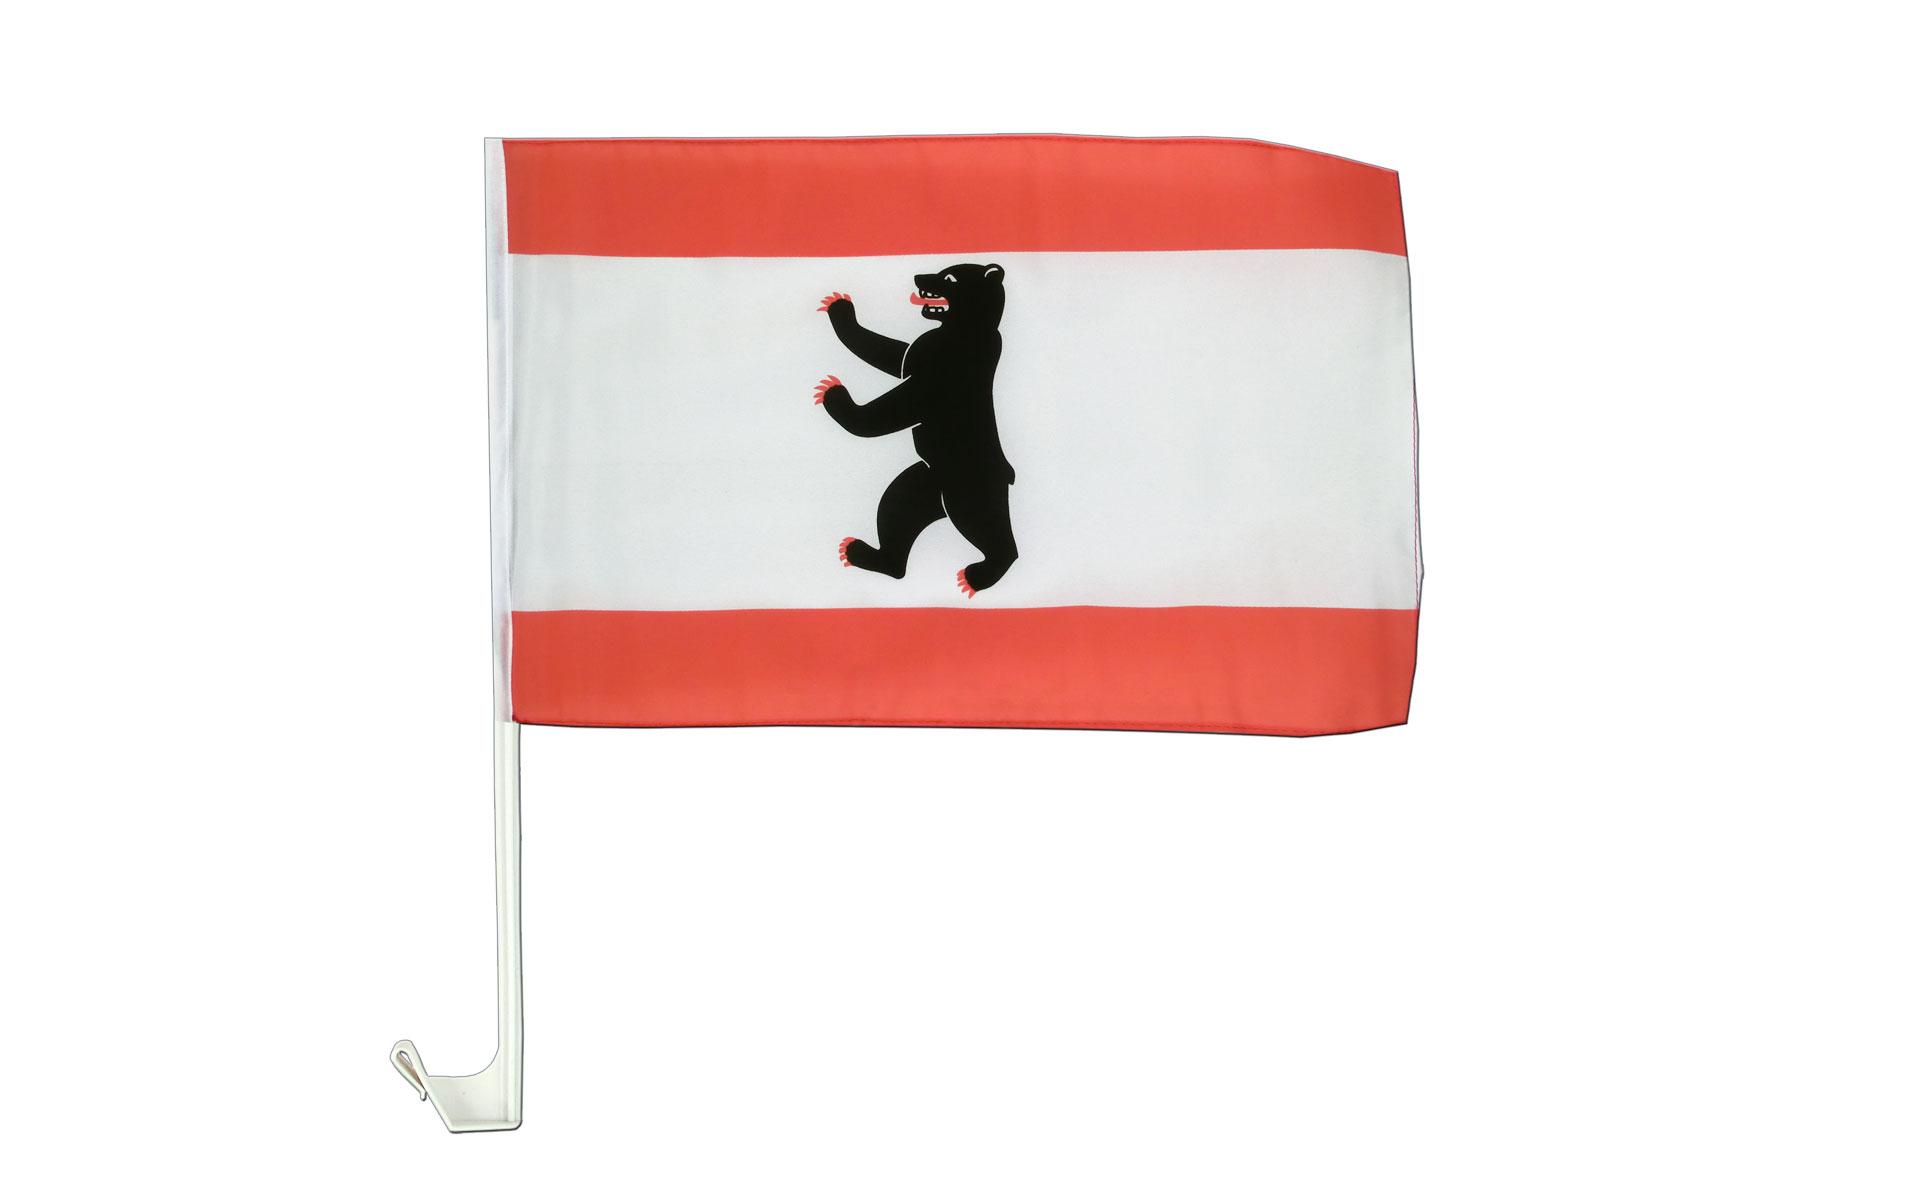 berlin car flag 12x16 royal flags. Black Bedroom Furniture Sets. Home Design Ideas